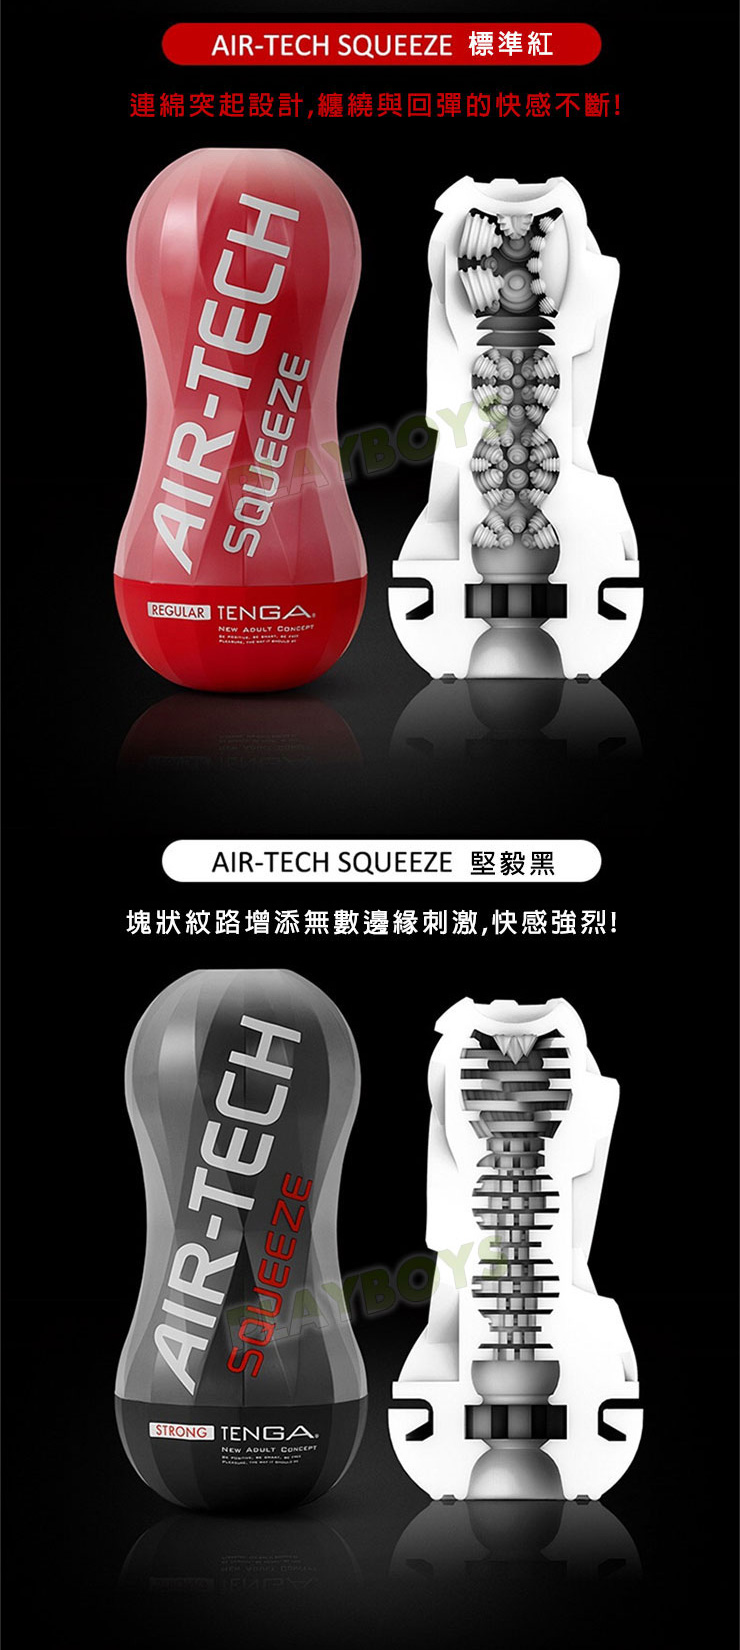 TENGA AIR-TECH 飛機杯 (軟硬適中)